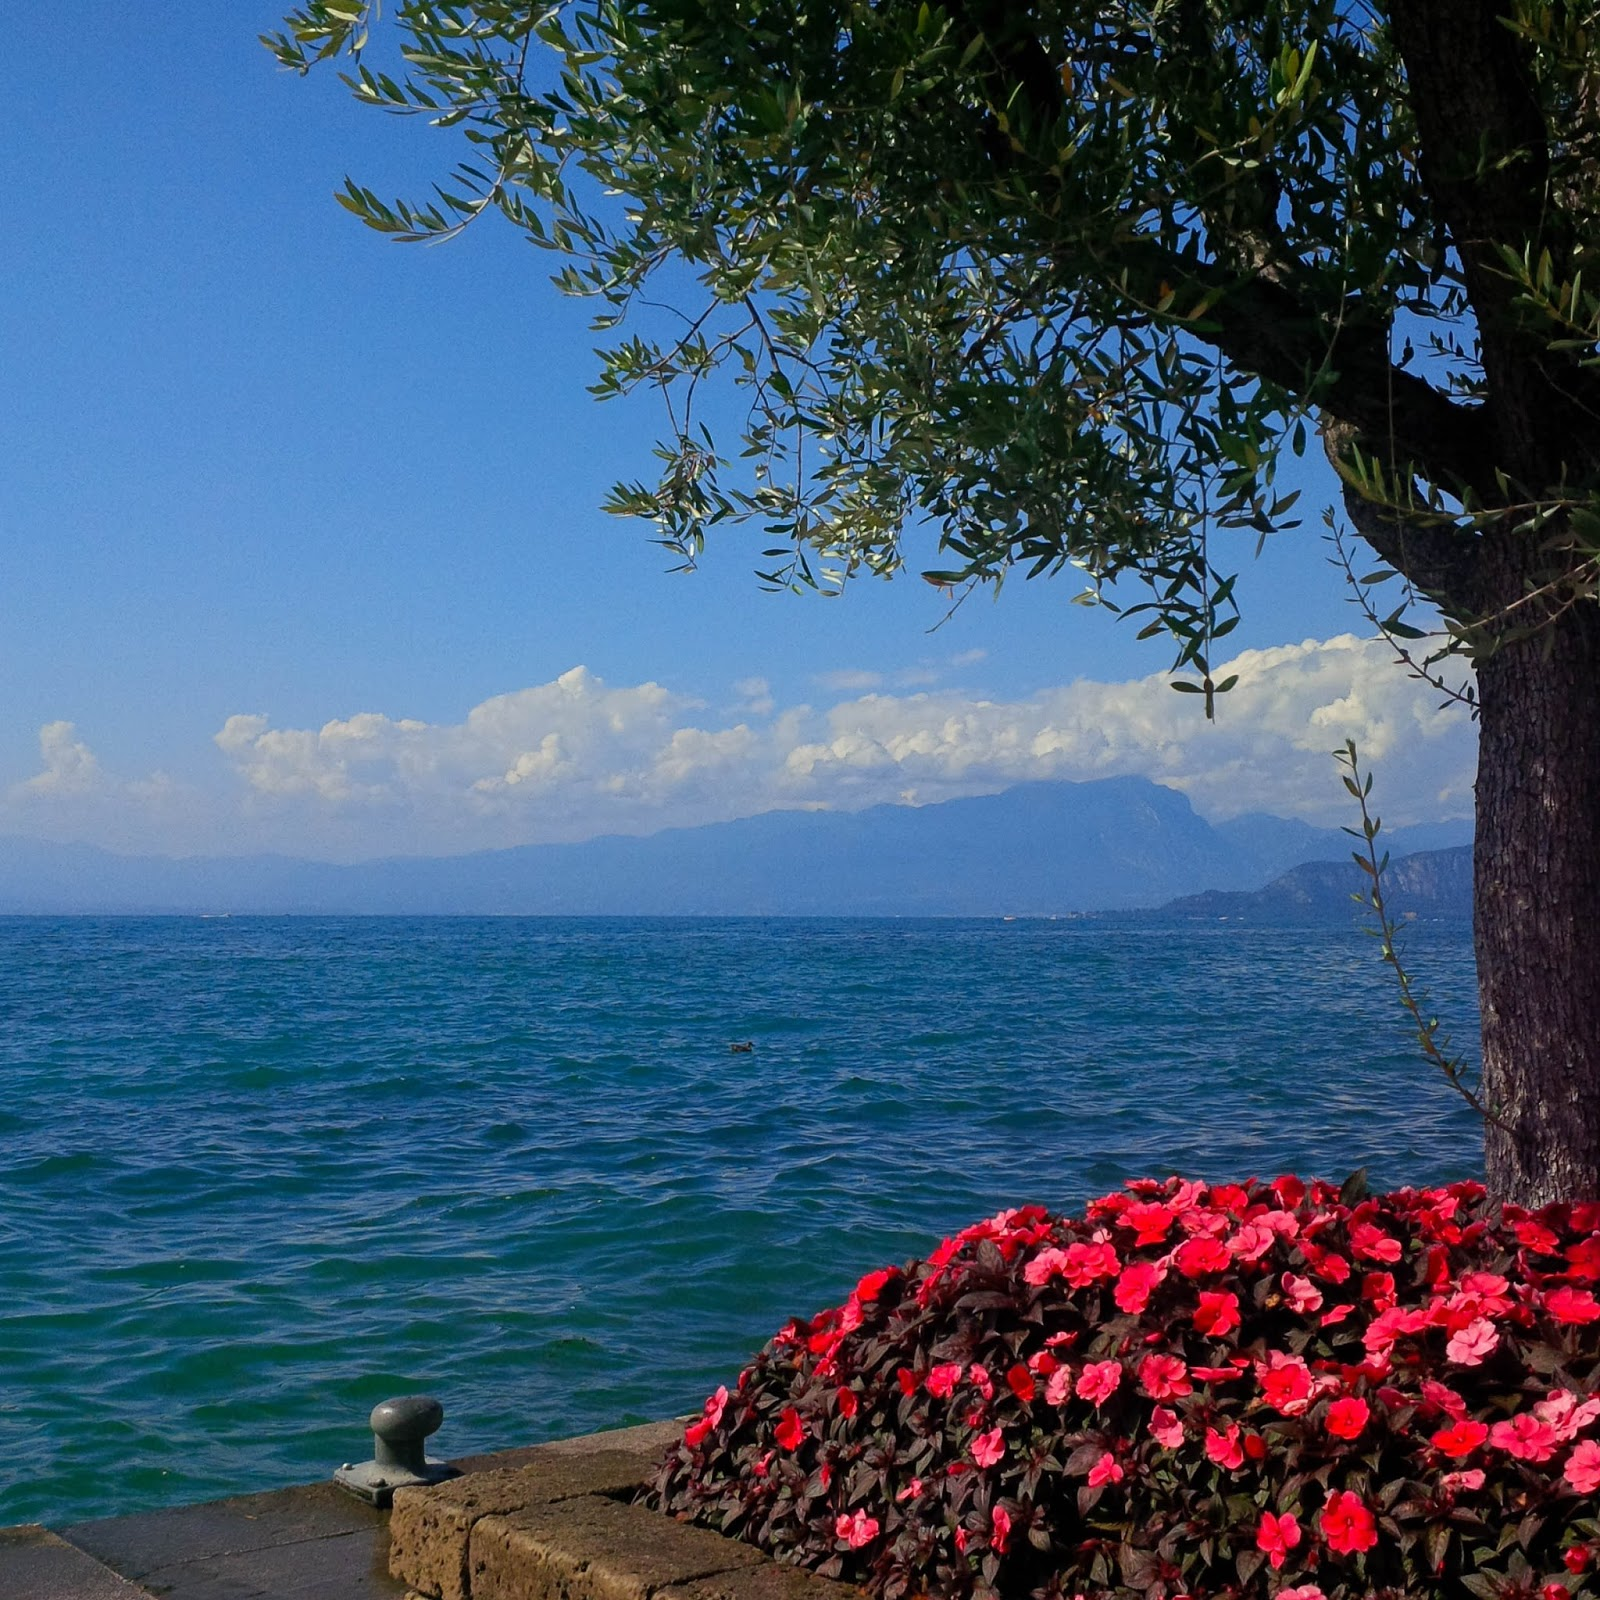 Lake Garda seen from Lazise, Veneto, Italy